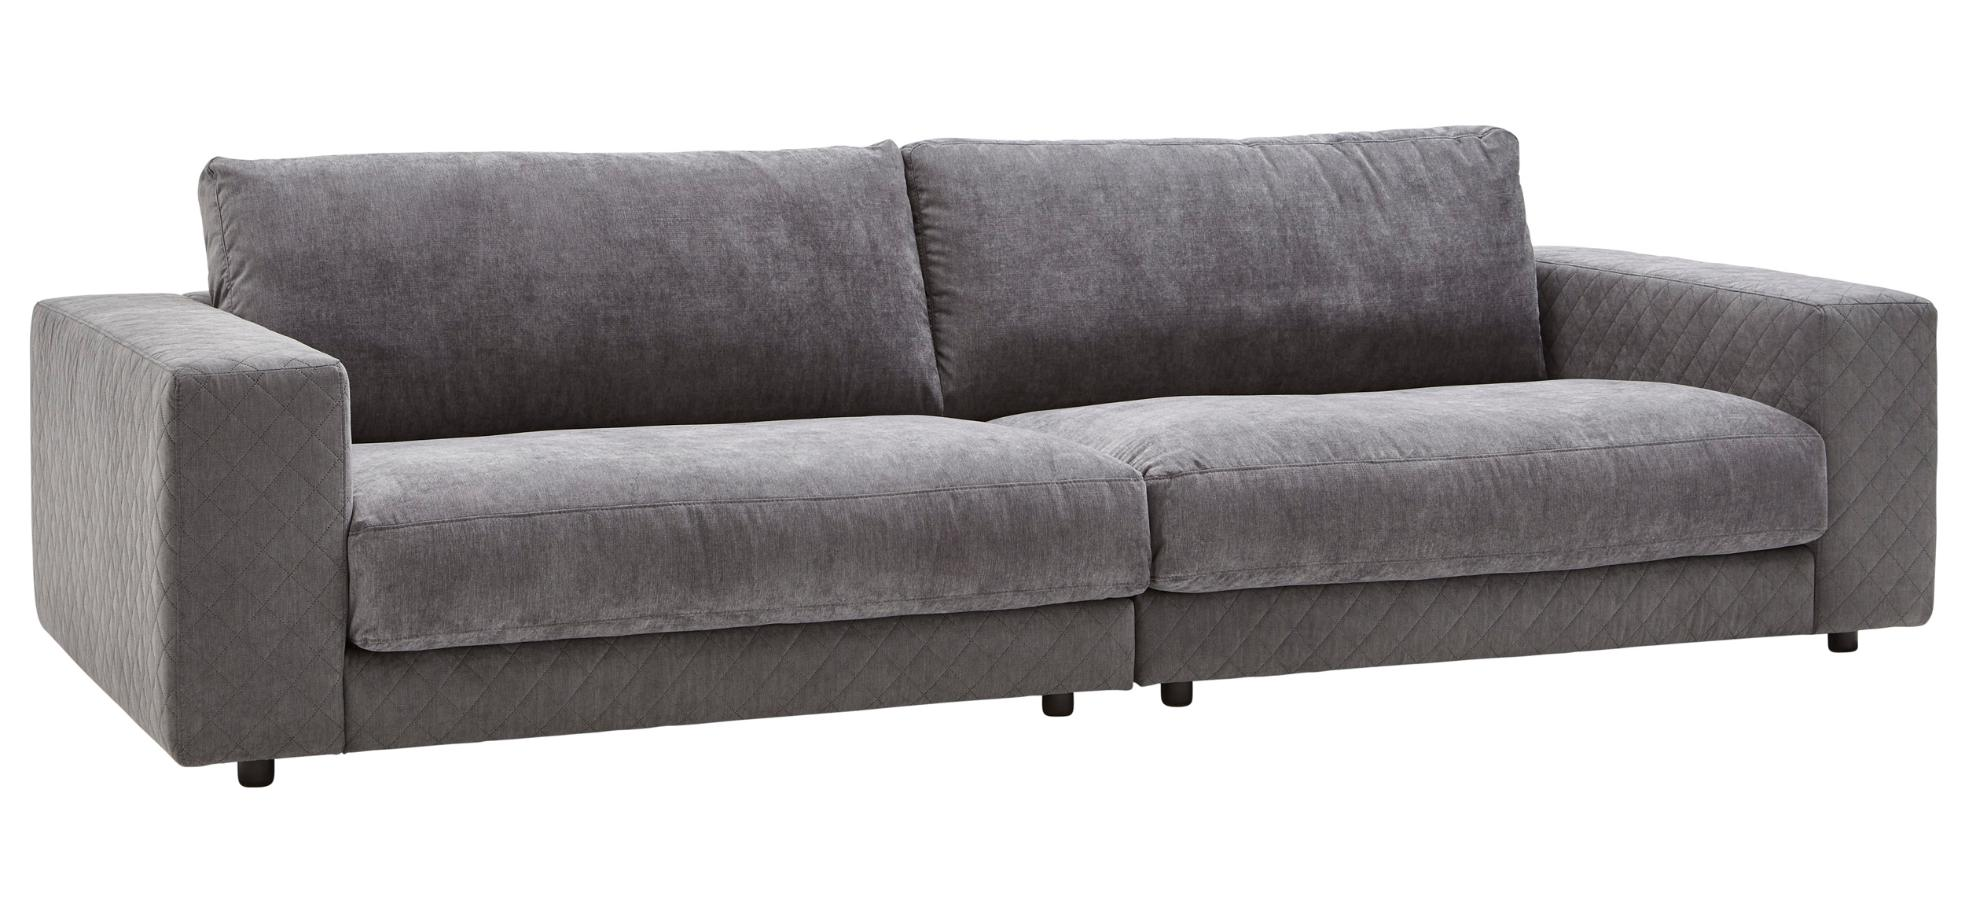 Full Size of Natura Sofa Couch Newport Denver Kansas Brooklyn 3 Sitzer Pasadena Select Mit Stoffminatrlich Freistil Indomo Dauerschläfer Lagerverkauf Schlafsofa Sofa Natura Sofa